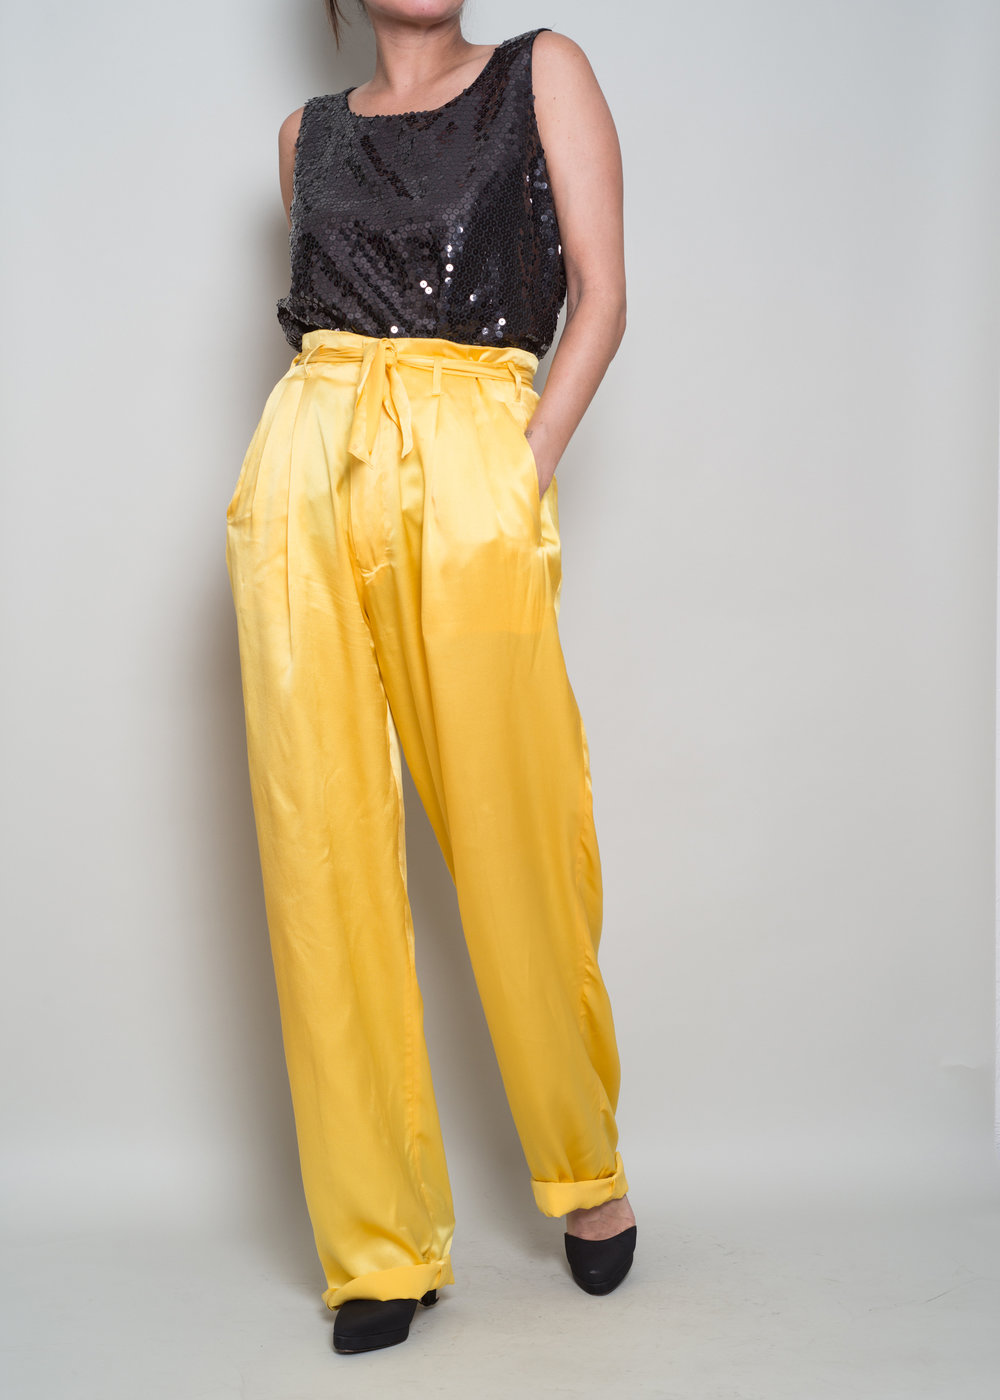 Vintage Yellow - A Part of the Rest Vintage Ralph Lauren Silk Trouser